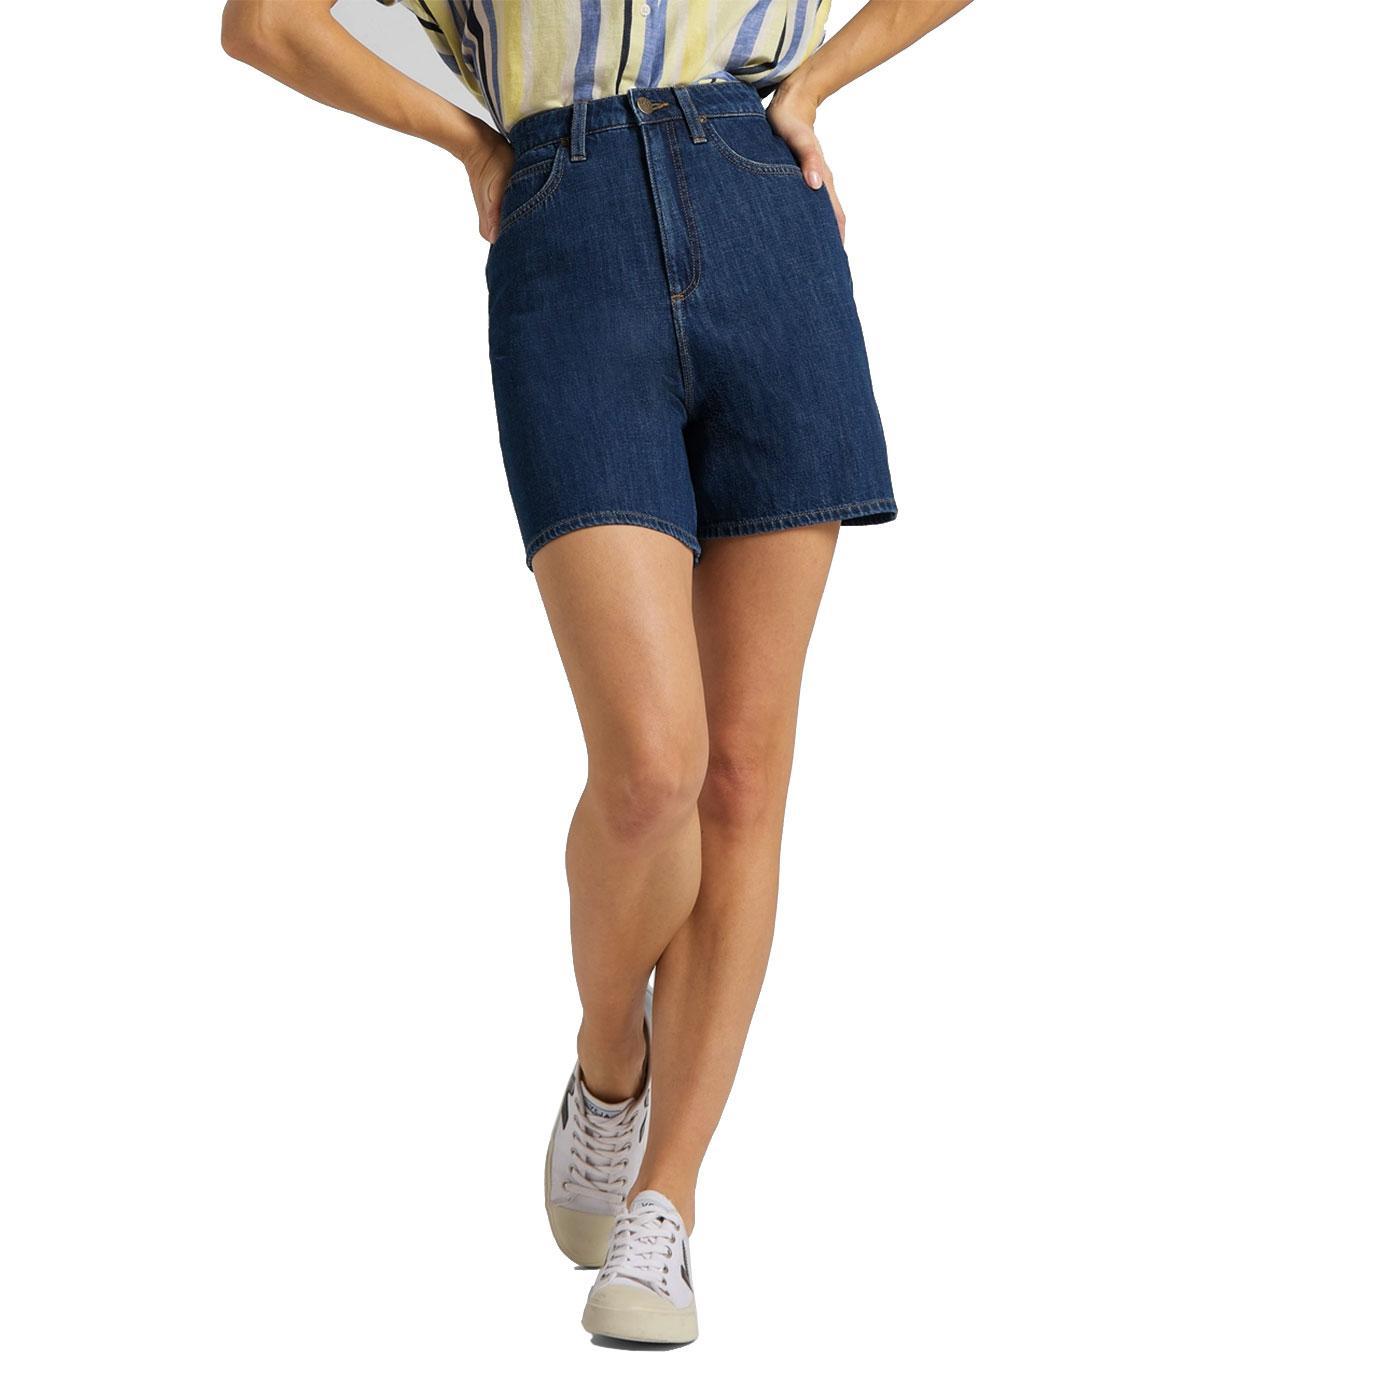 Stella LEE JEANS Womens High Wasit Shorts - Rinse